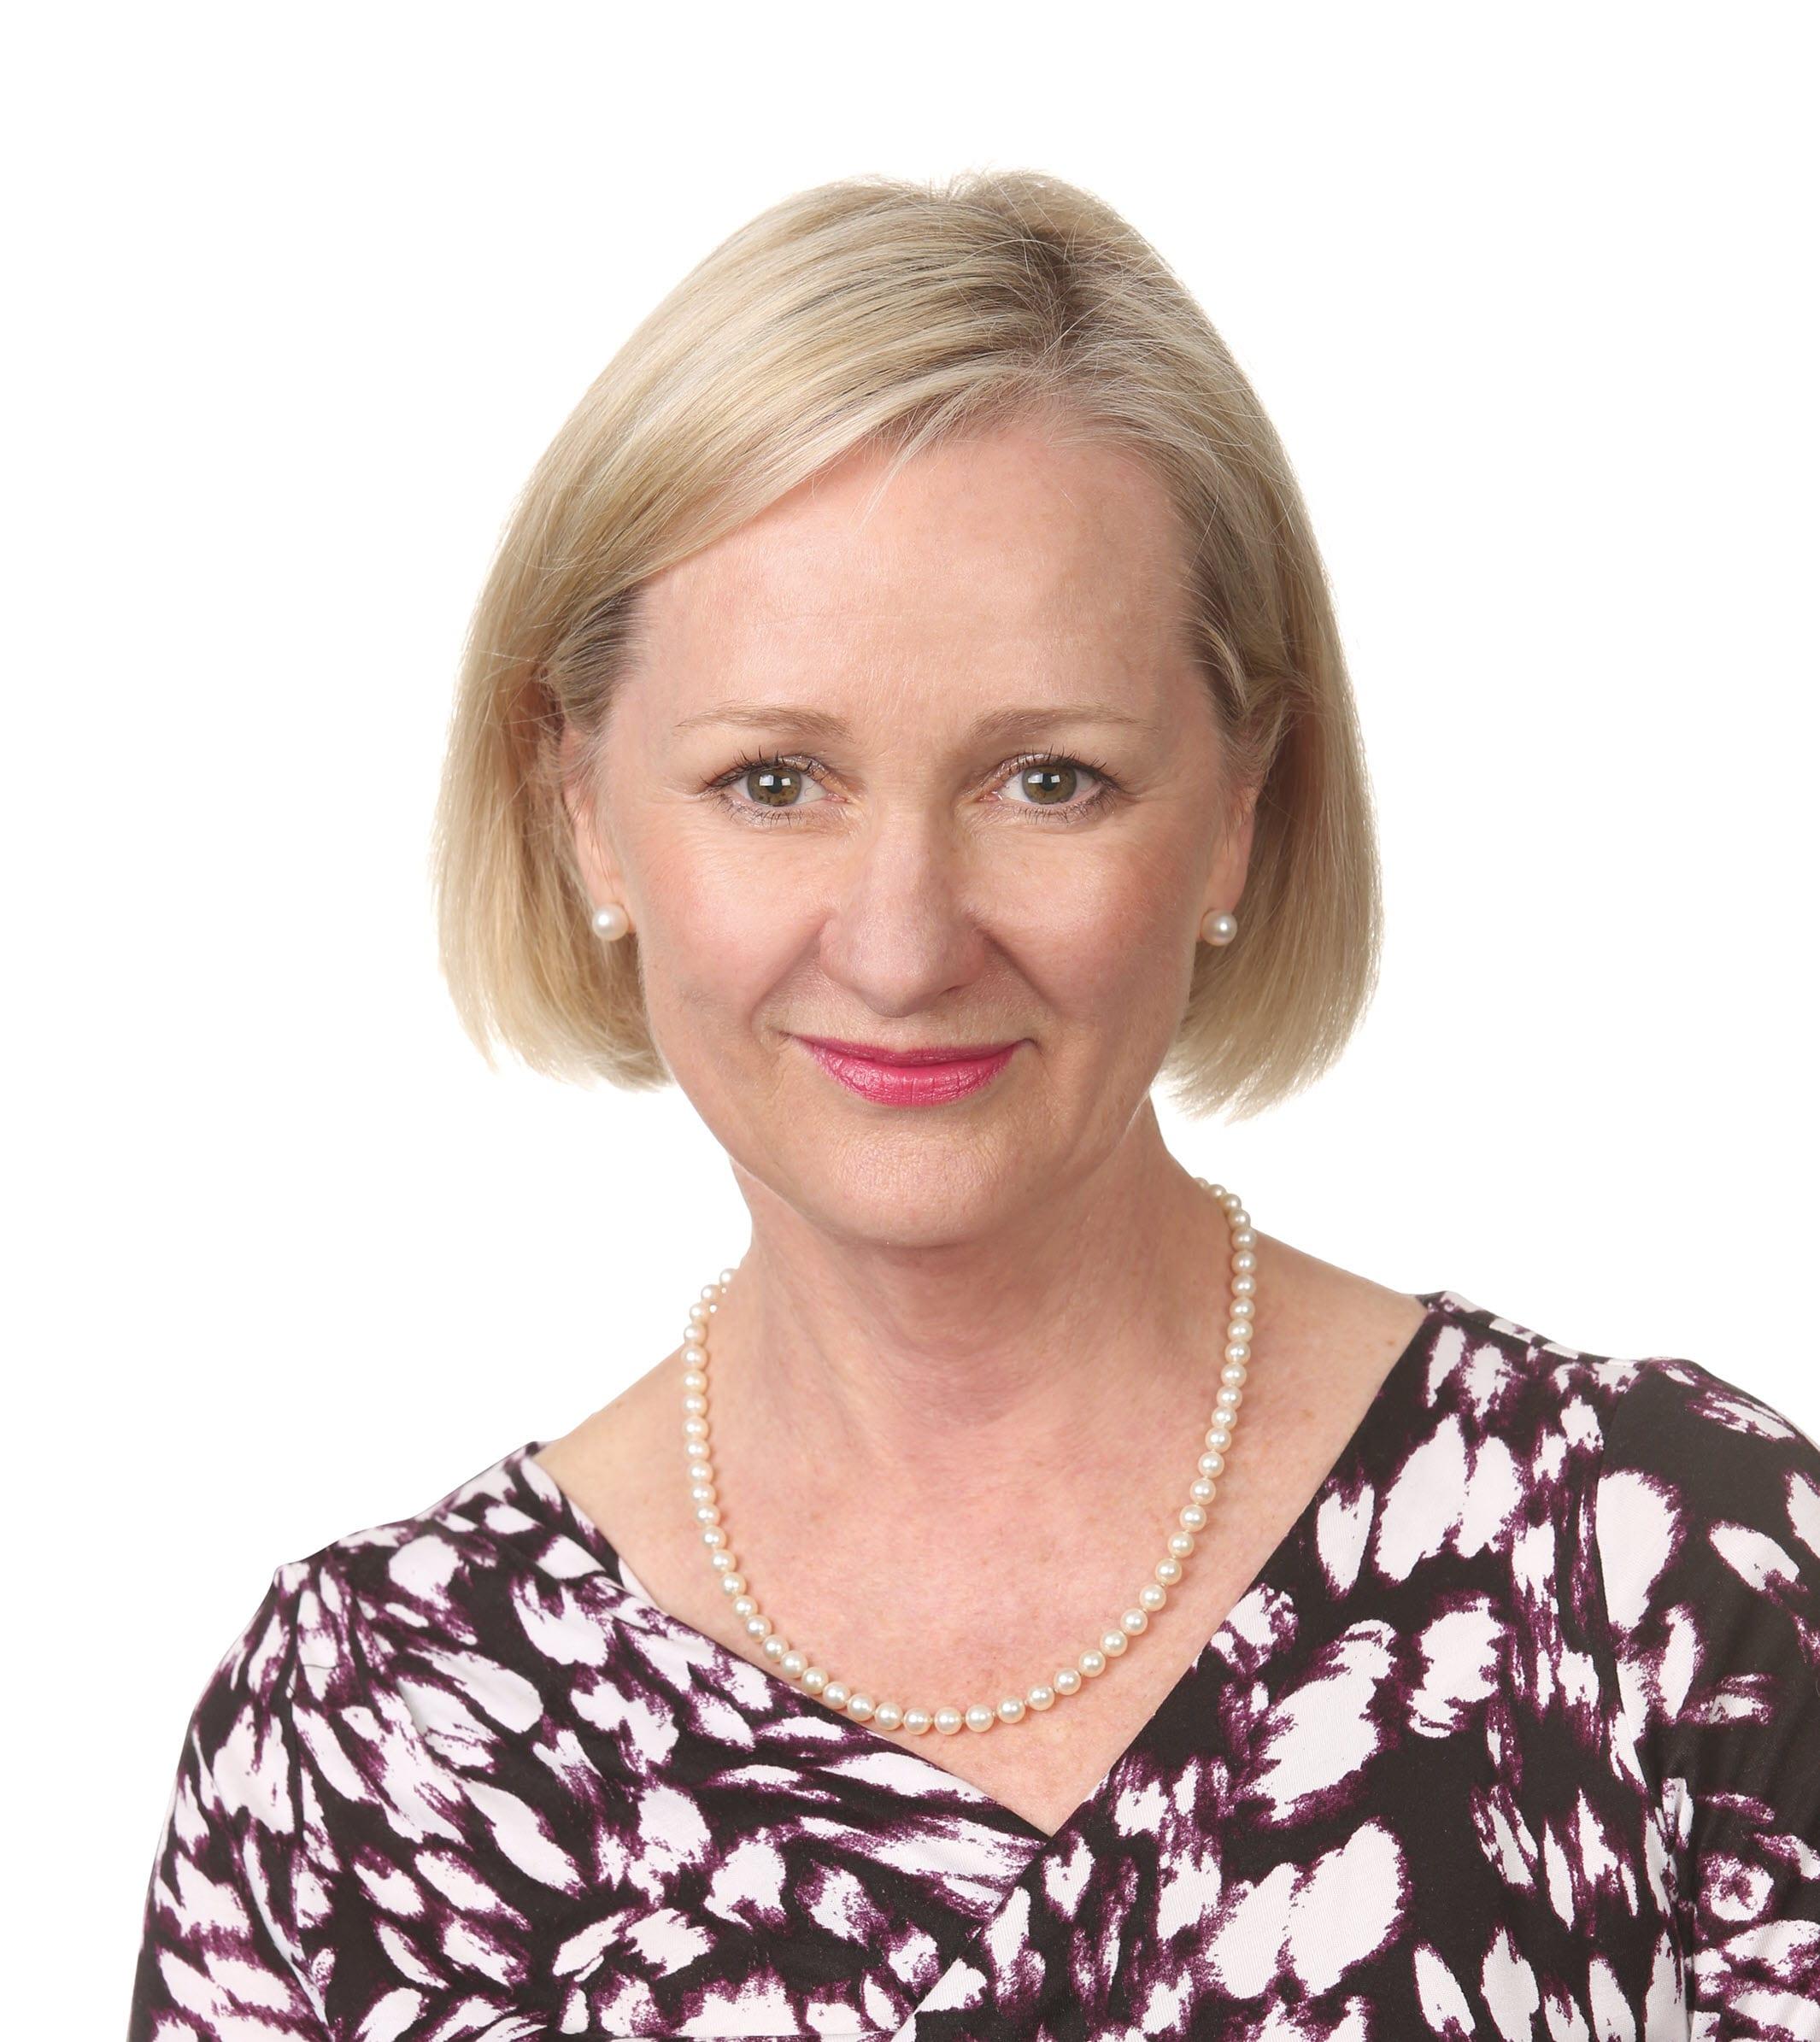 Brenda Wilson - ACH Board member